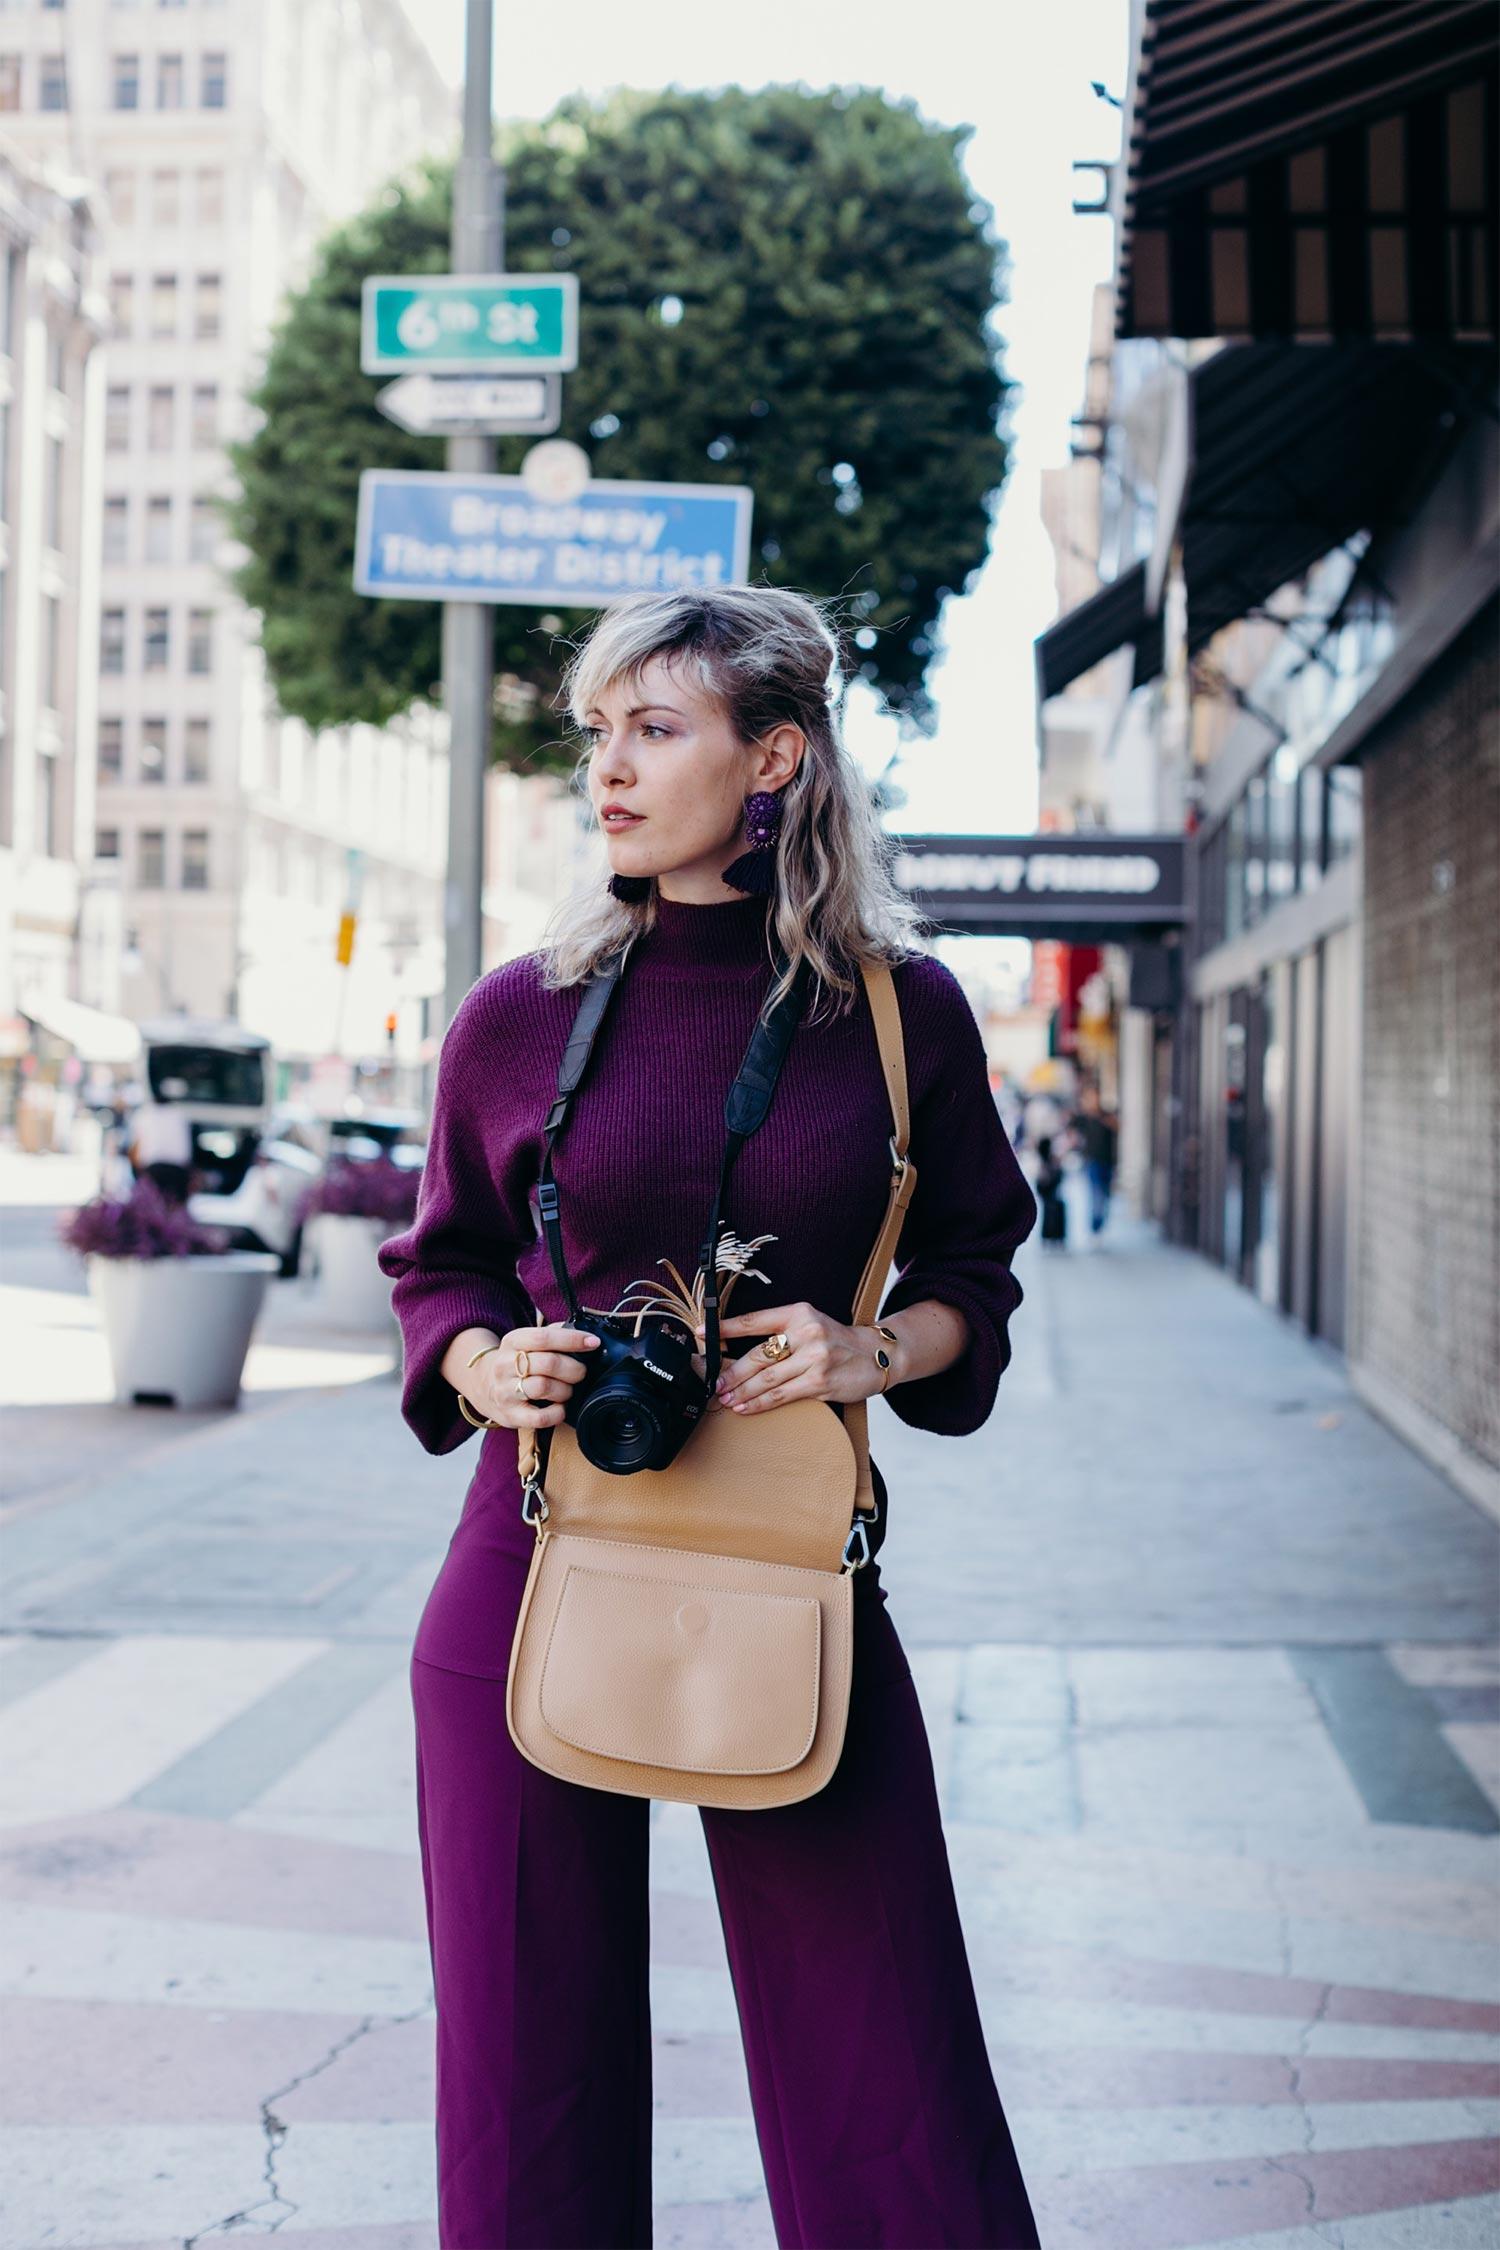 Gatta Chic Camera Bags content creation by Meraki Narrative: A Branding, Design, and Creative Agency